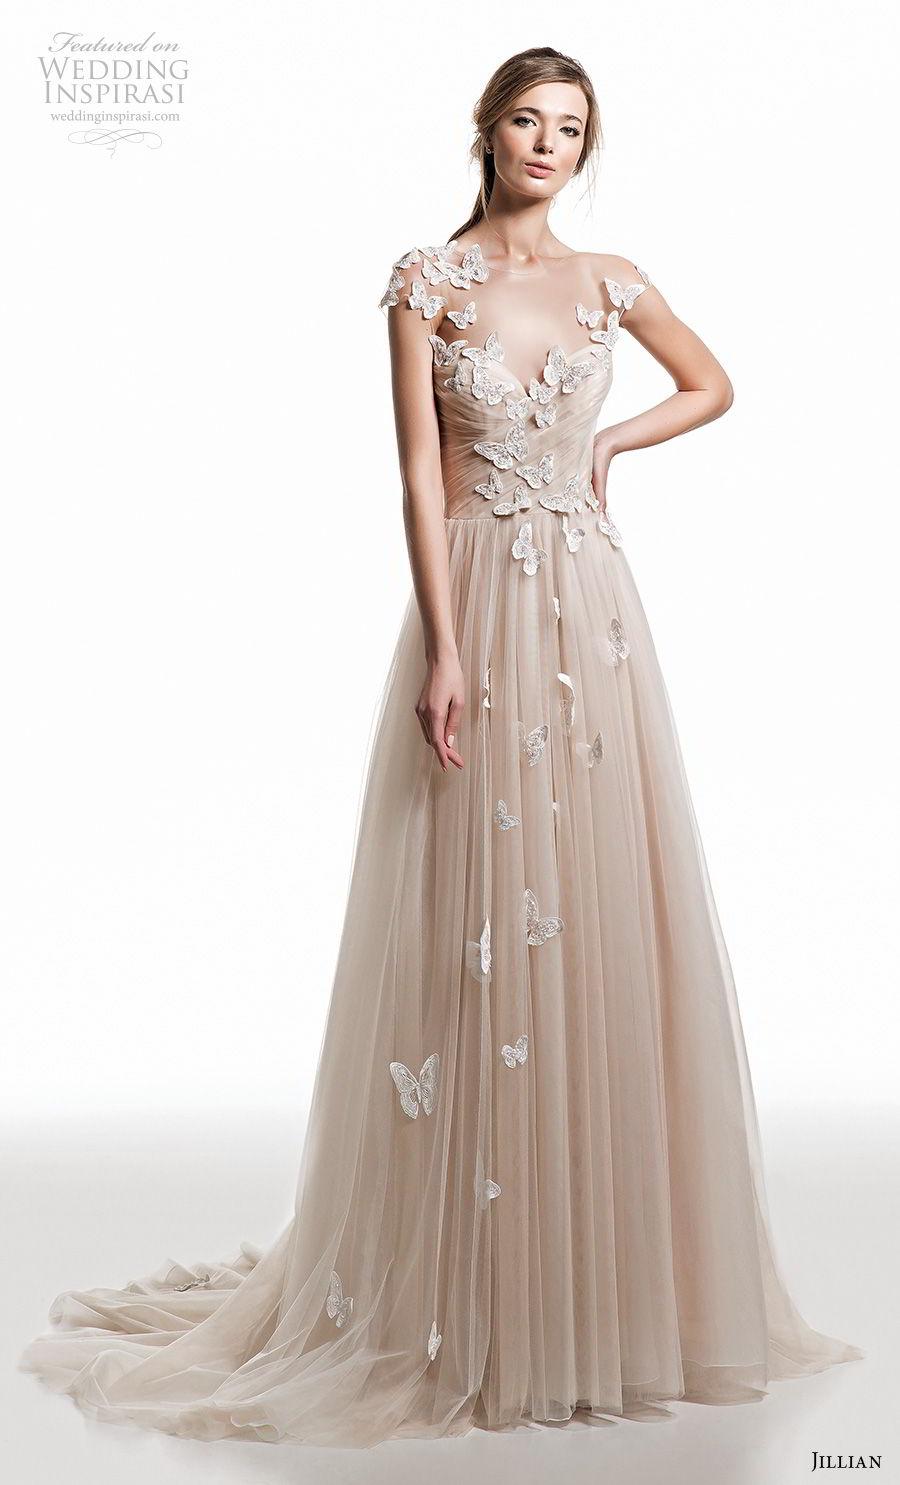 jillian 2019 bridal cap sleeves illusion bateau sweetheart neckline heavily embellished bodice romantic champagne modified a  line wedding dress open back medium train (5) mv